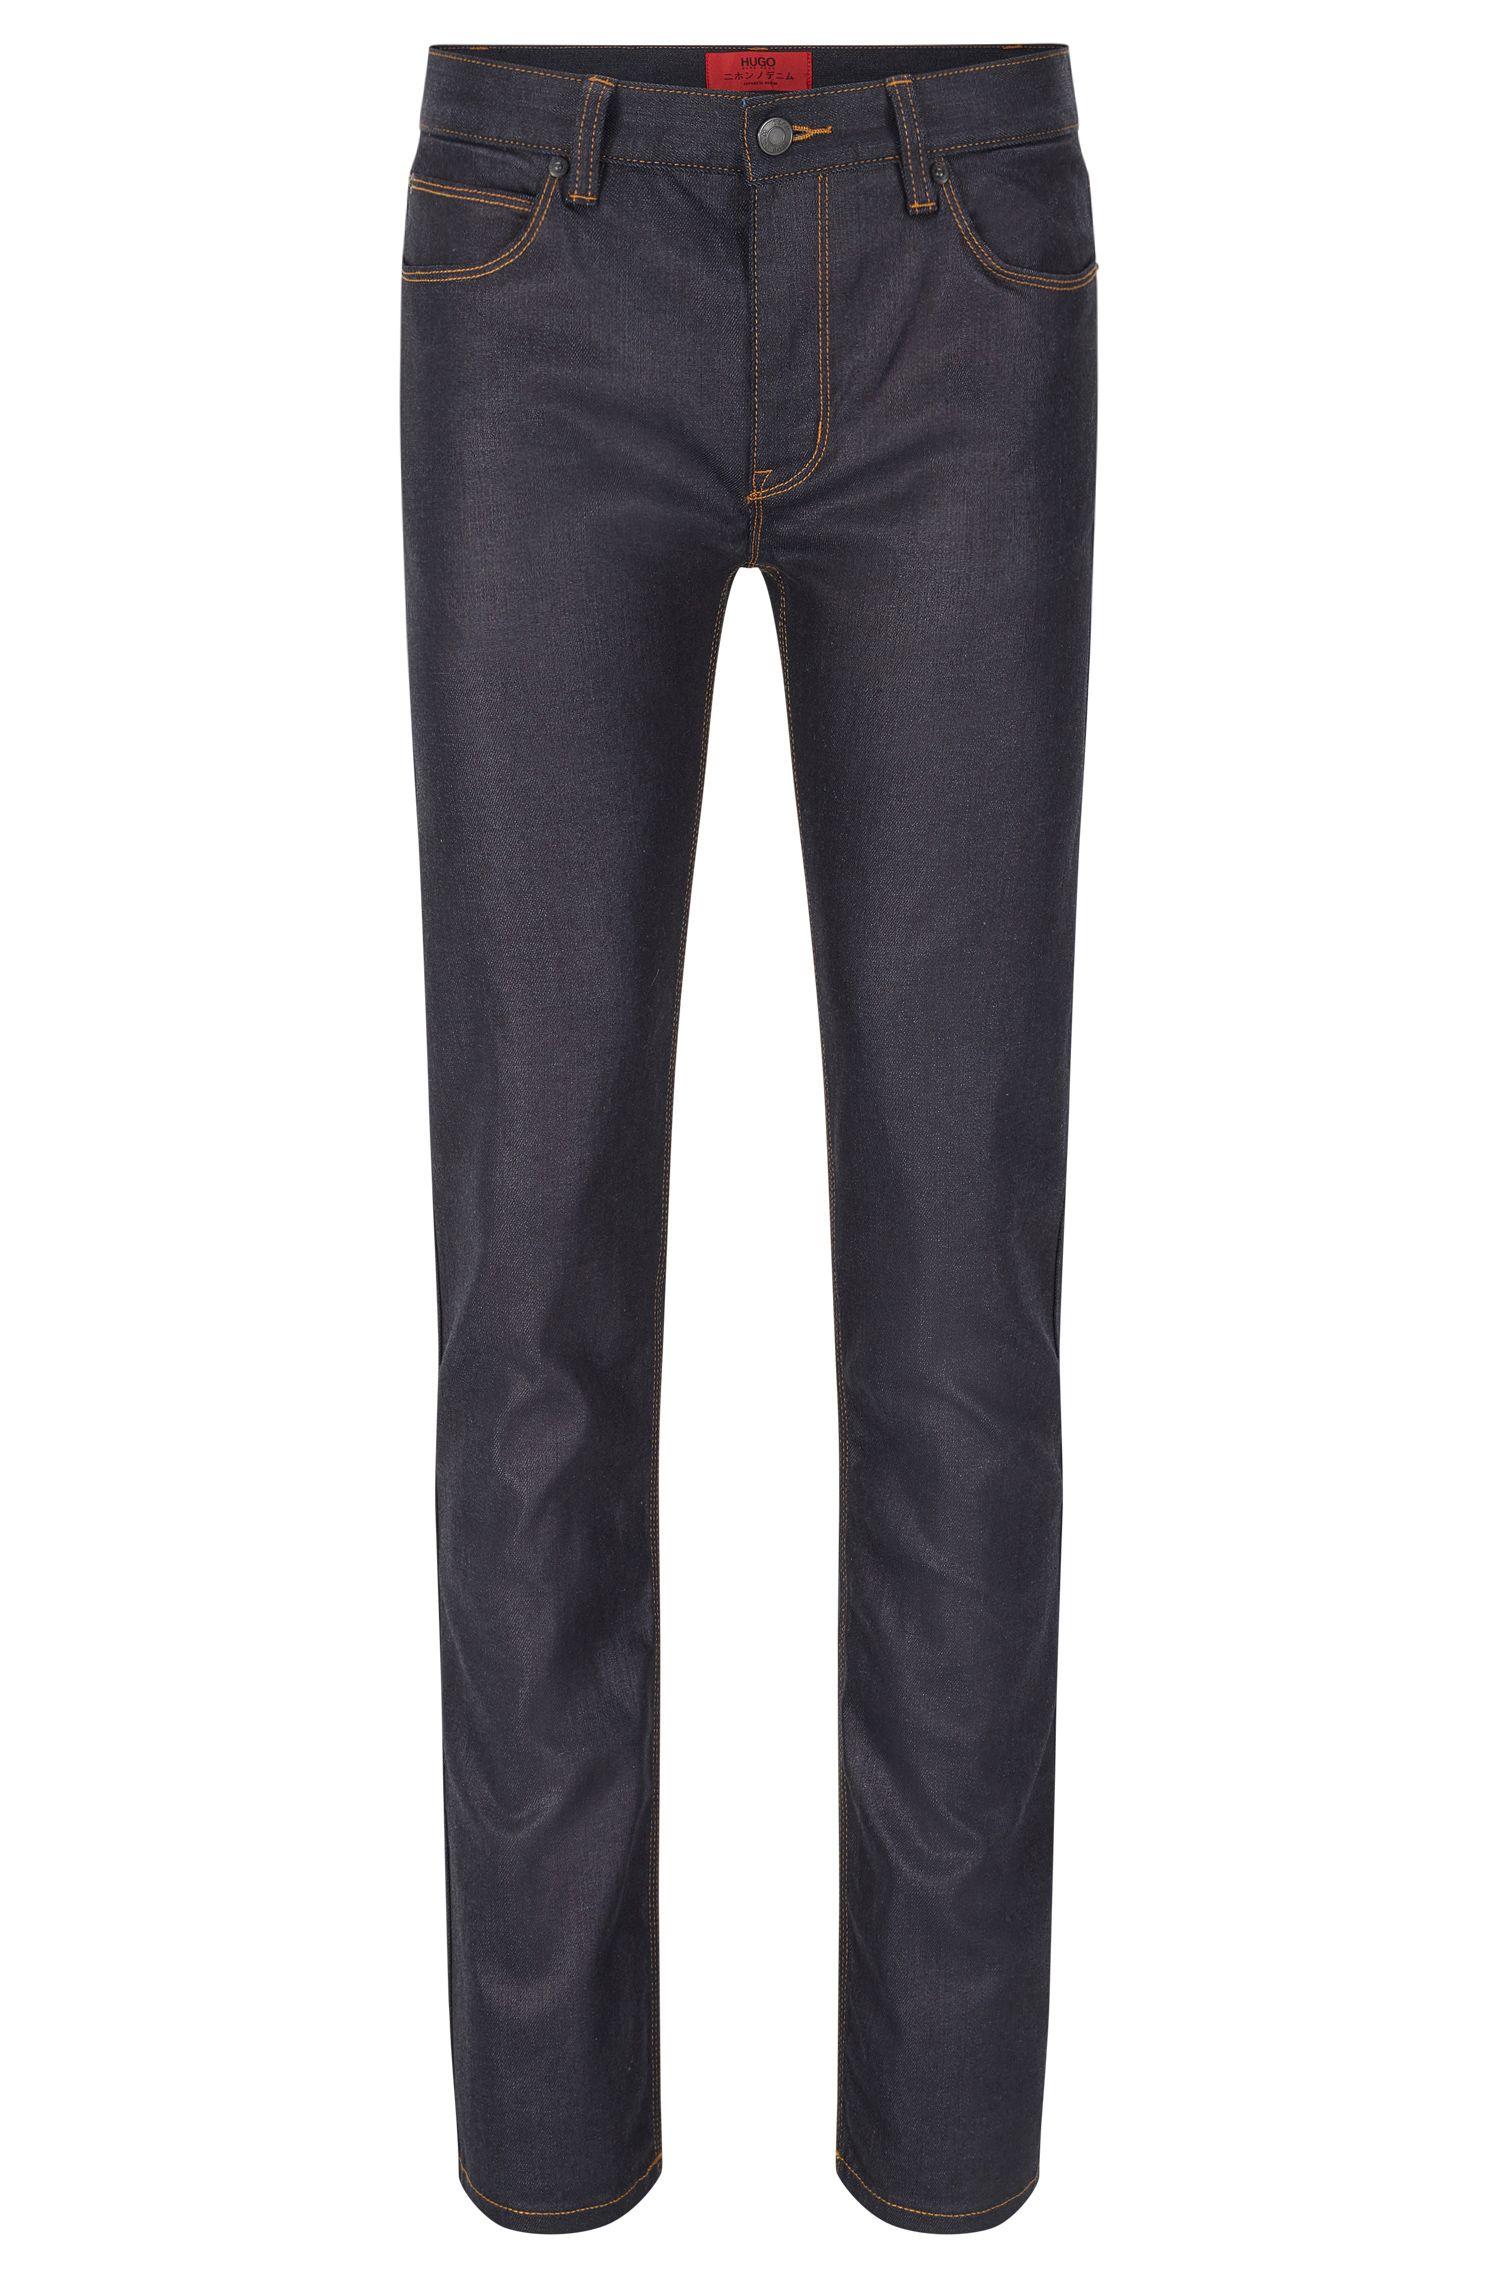 'HUGO 708' | Slim Fit, 10.25 oz Coated Japanese Denim Jeans